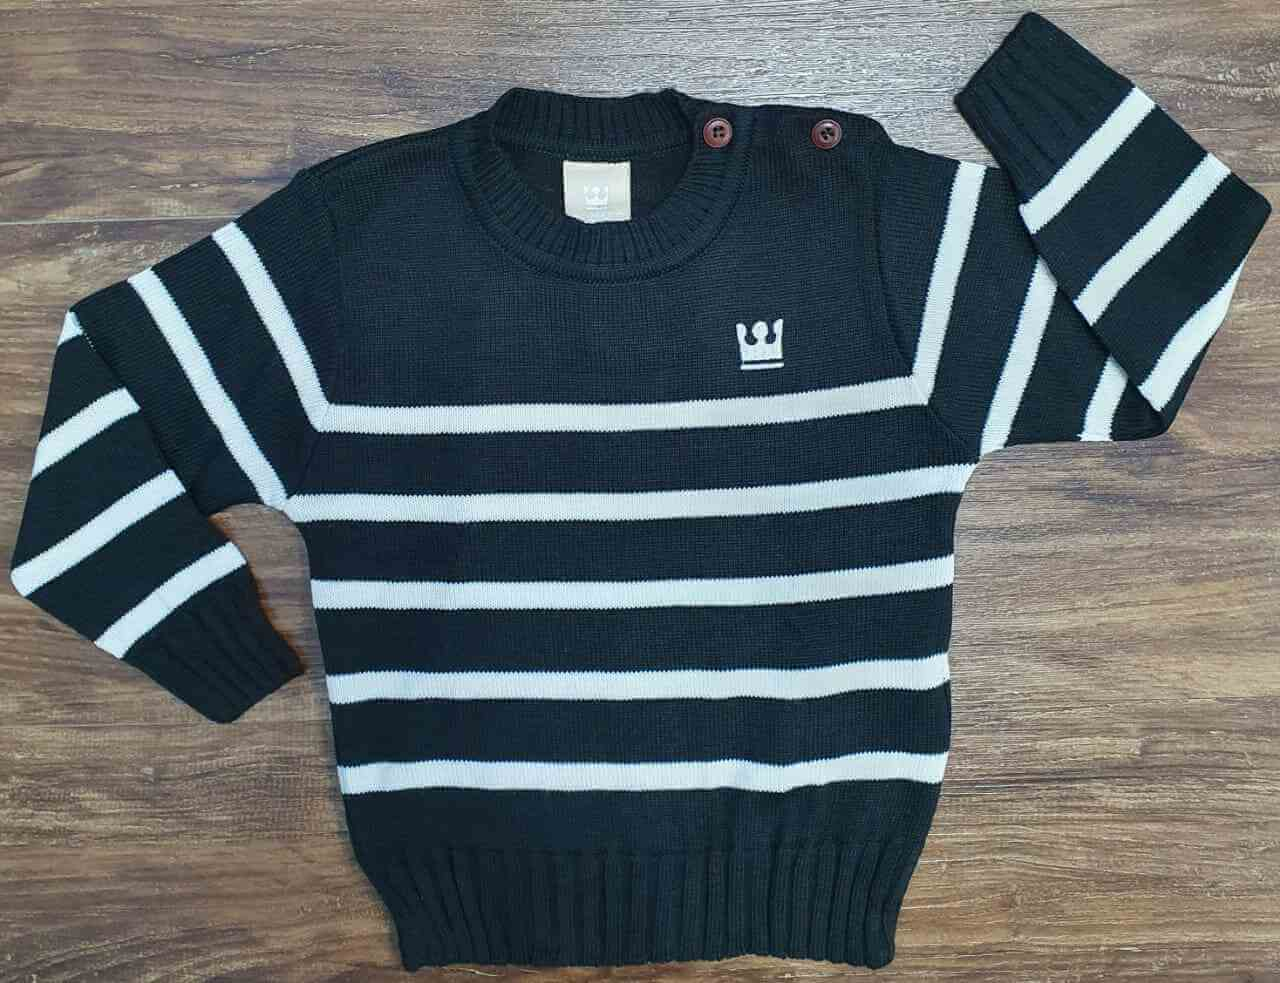 Suéter Listrado Preto e Branco Infantil